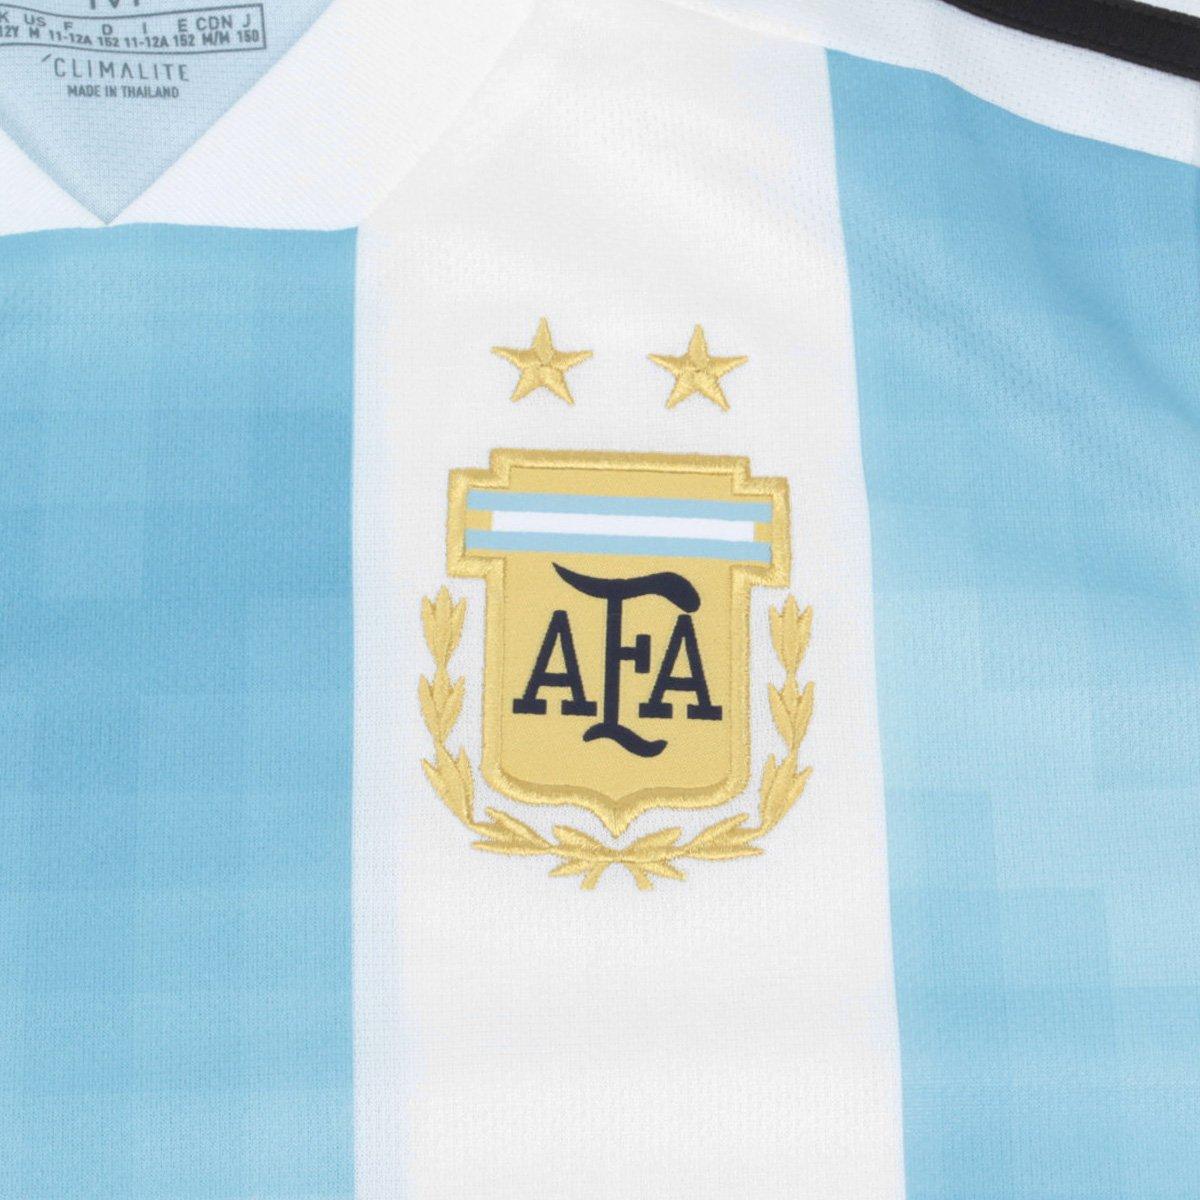 ... Camisa Infantil Seleção Argentina Home 2018 s n° Torcedor Adidas ... 144287c57dbe1